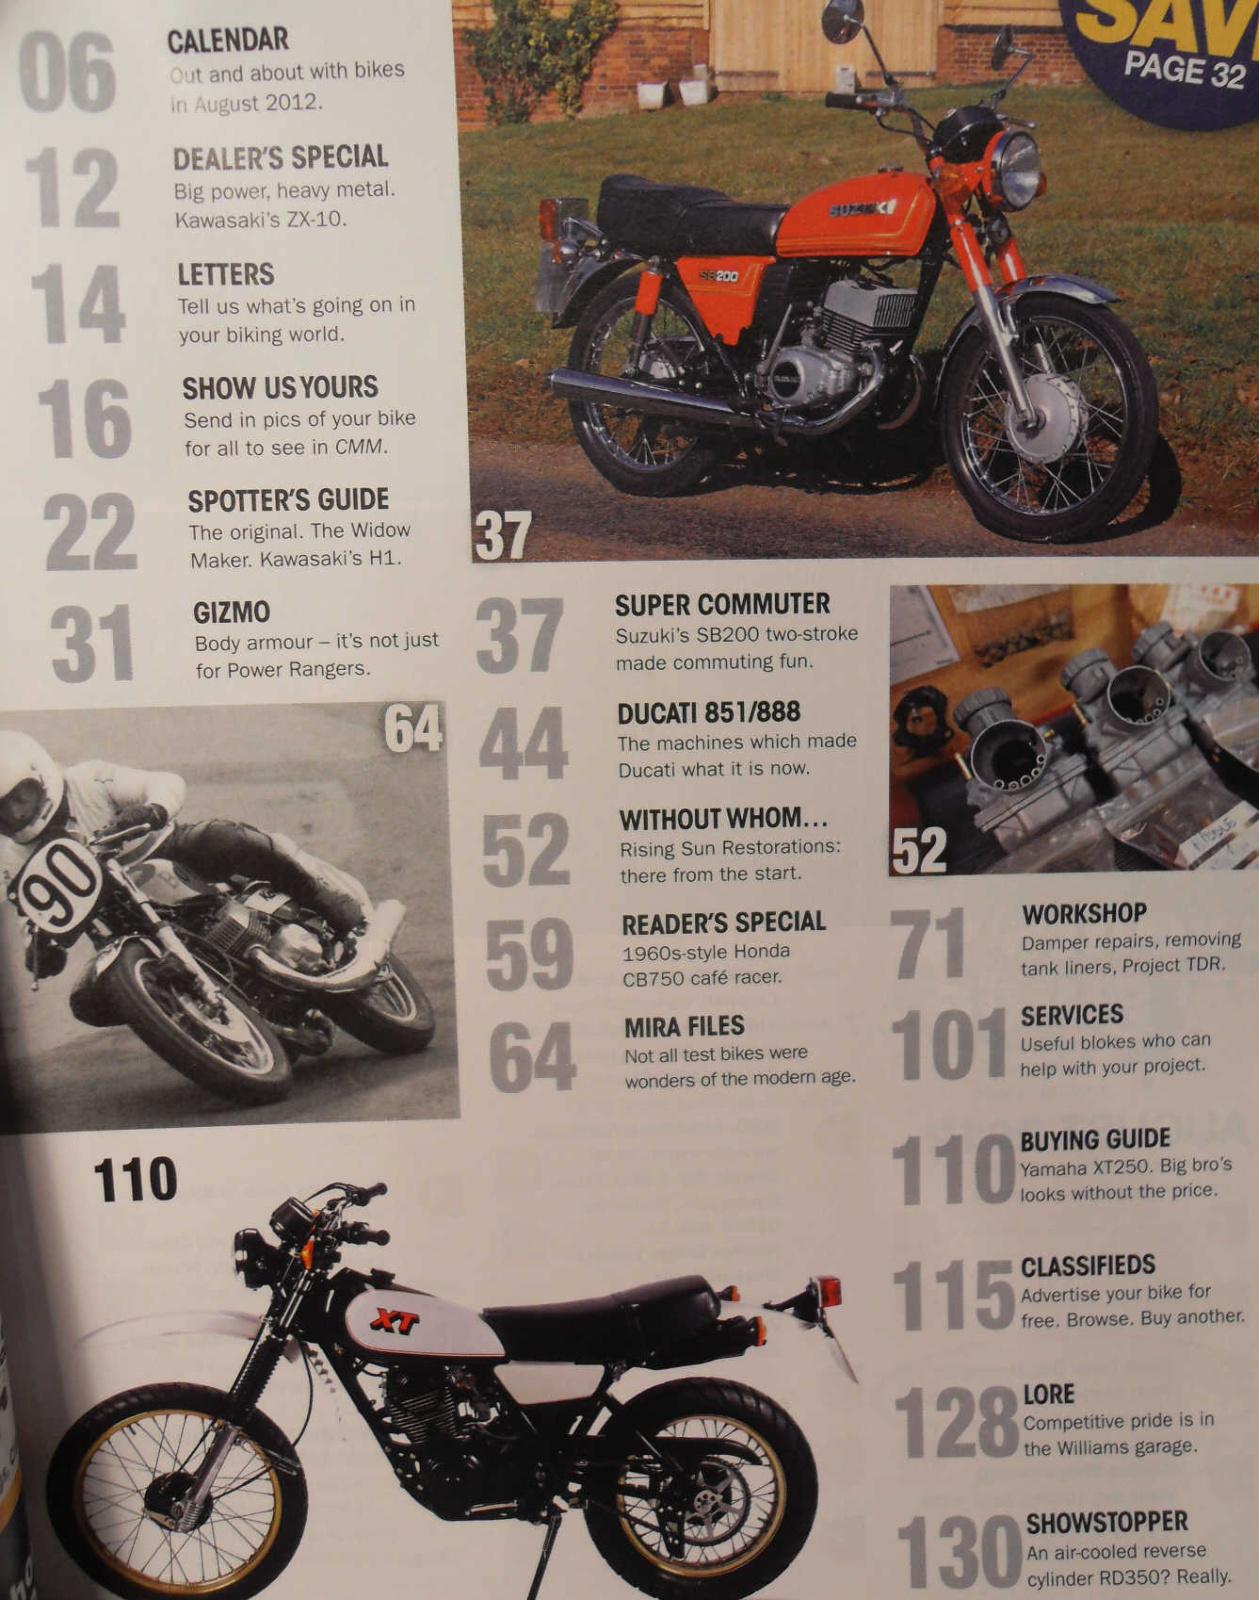 Classic mechanics aug 2012 suzuki sb200 ducati 851 888 for Yamaha sun classic parts